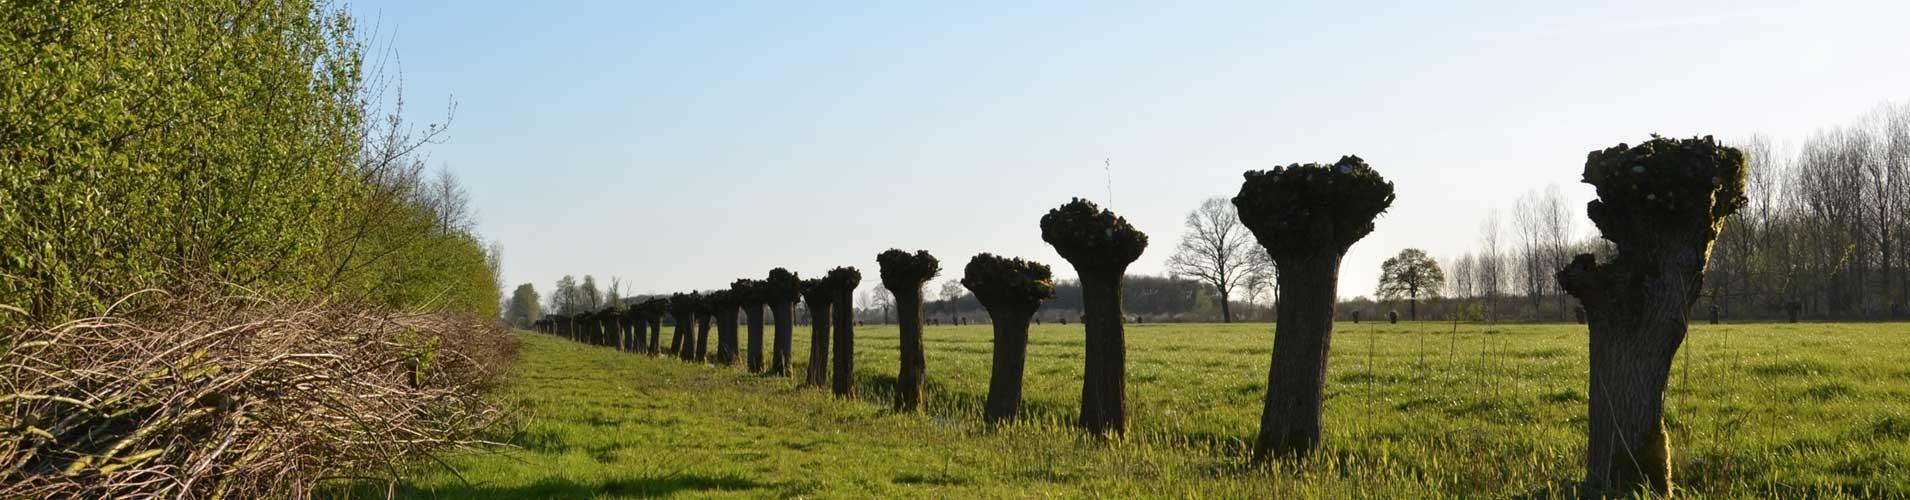 geknotte bomen